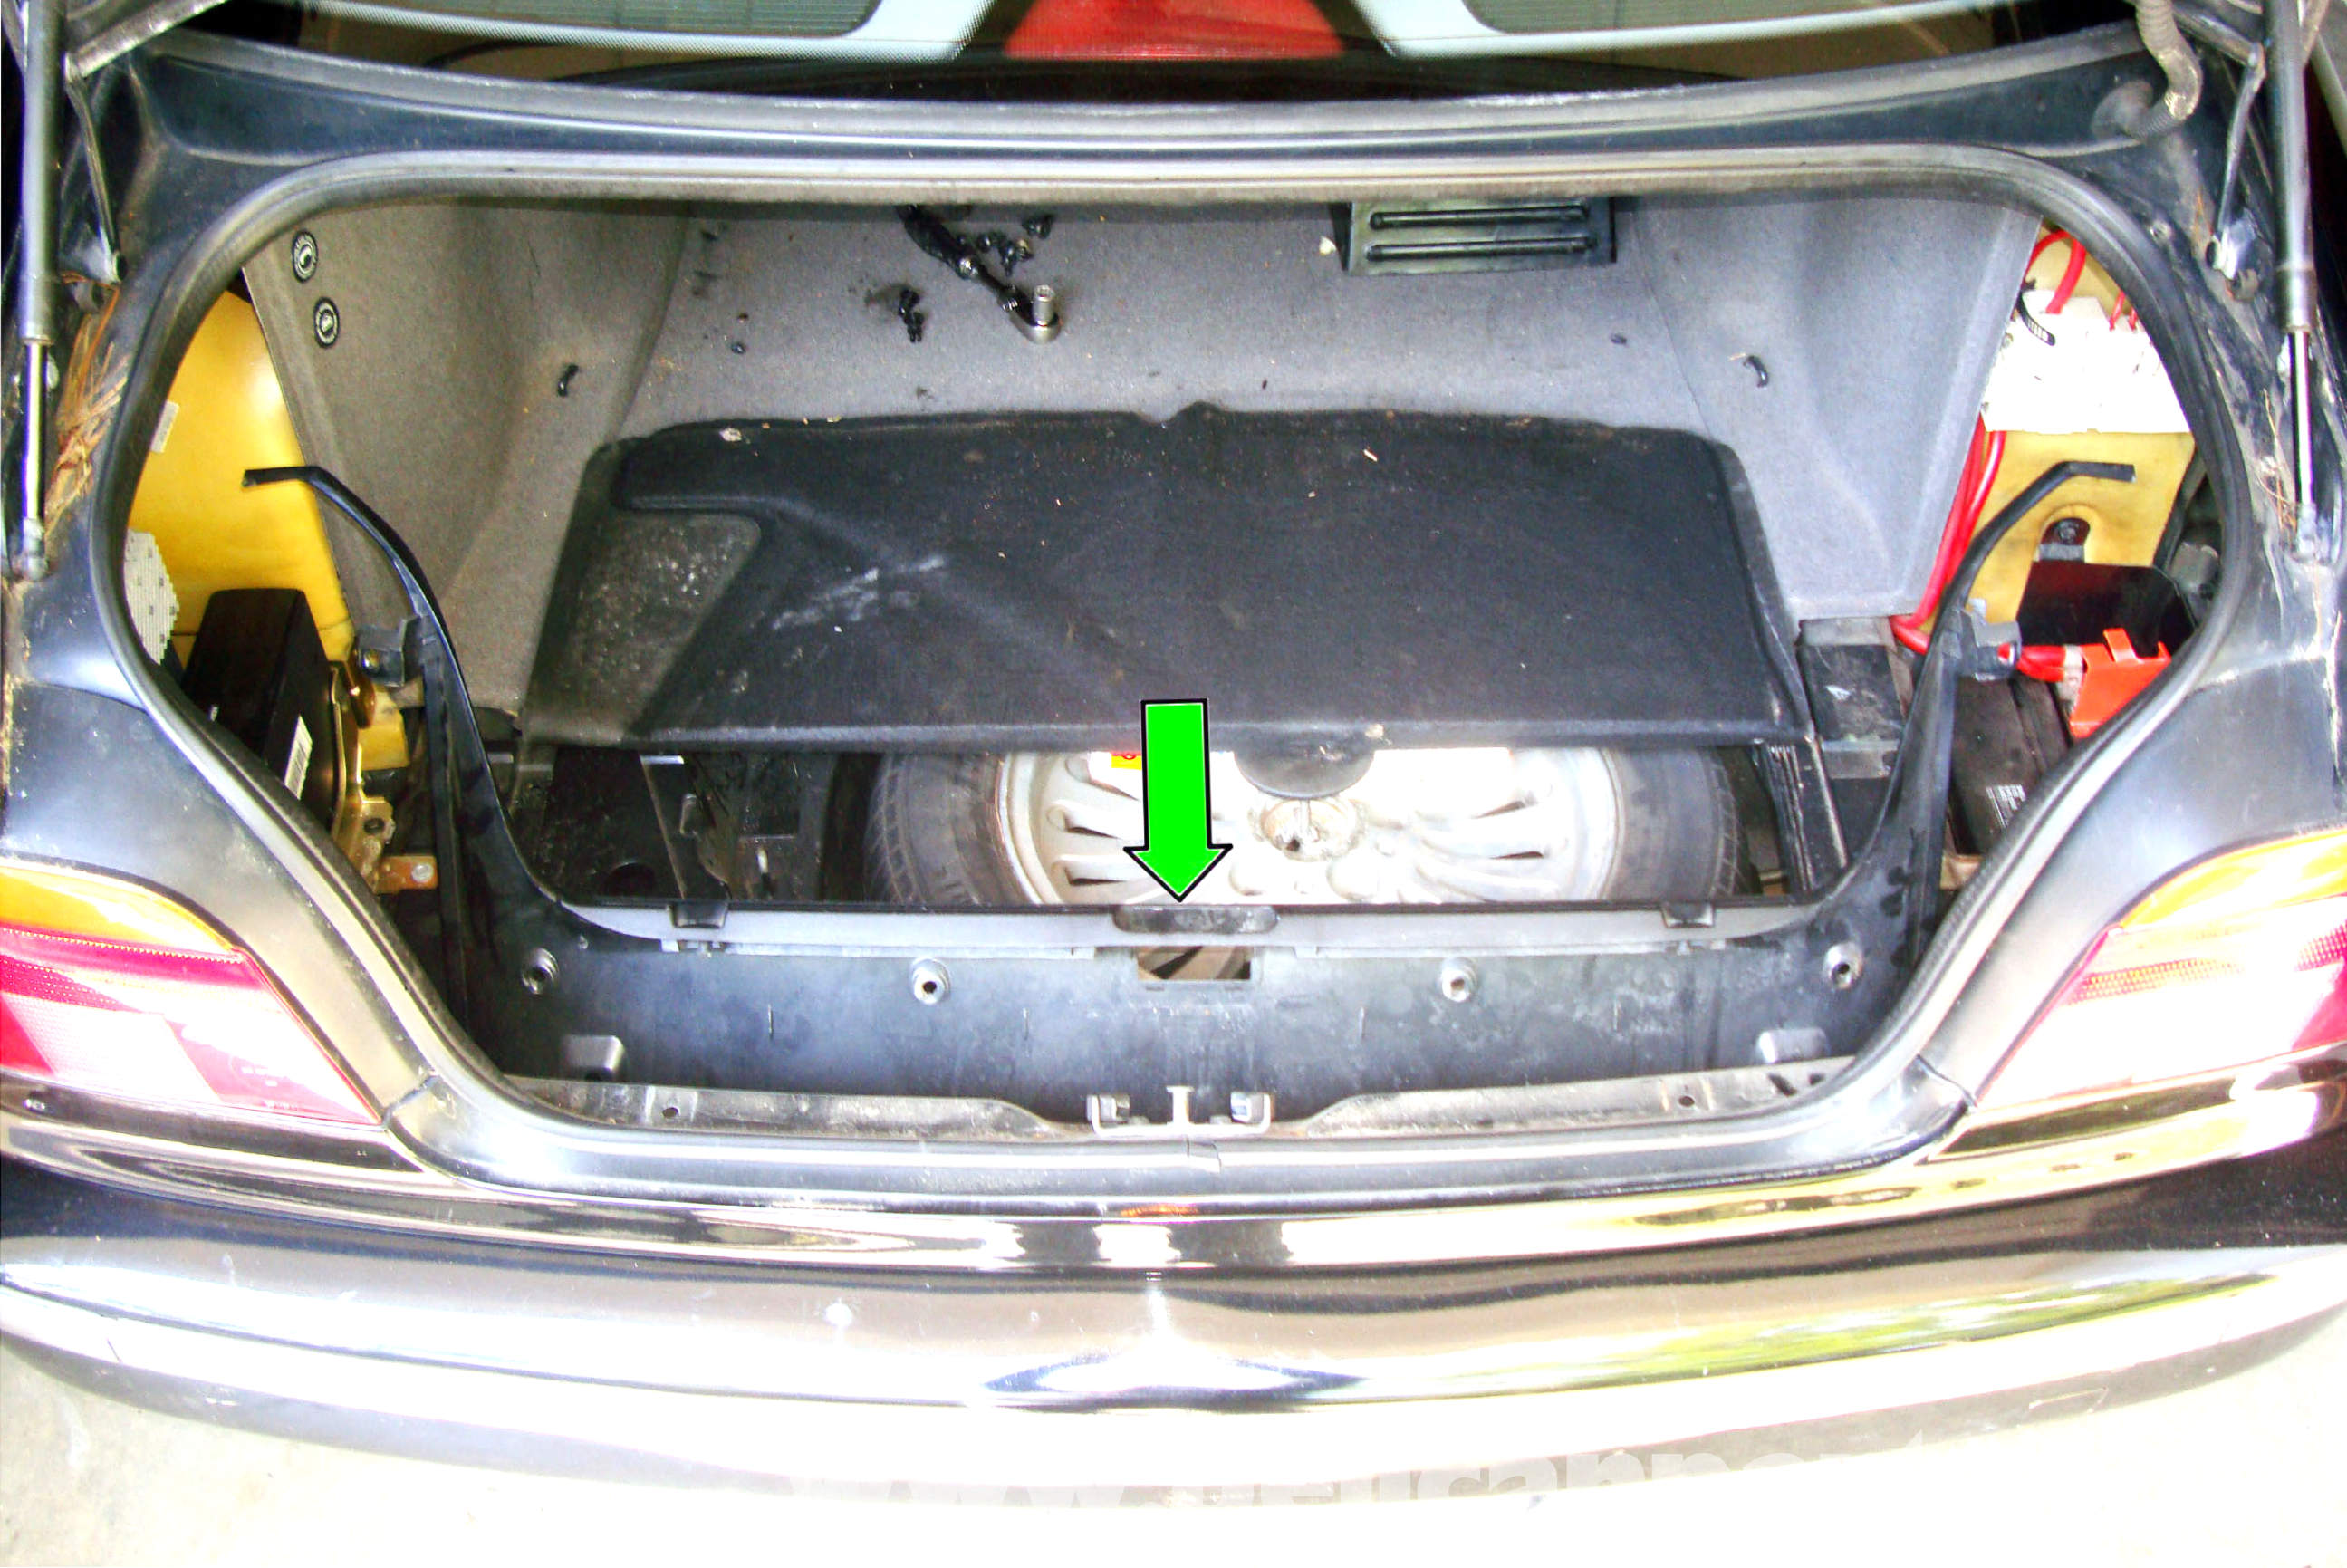 bmw e39 5 series rear bumper removal 1997 2003 525i. Black Bedroom Furniture Sets. Home Design Ideas